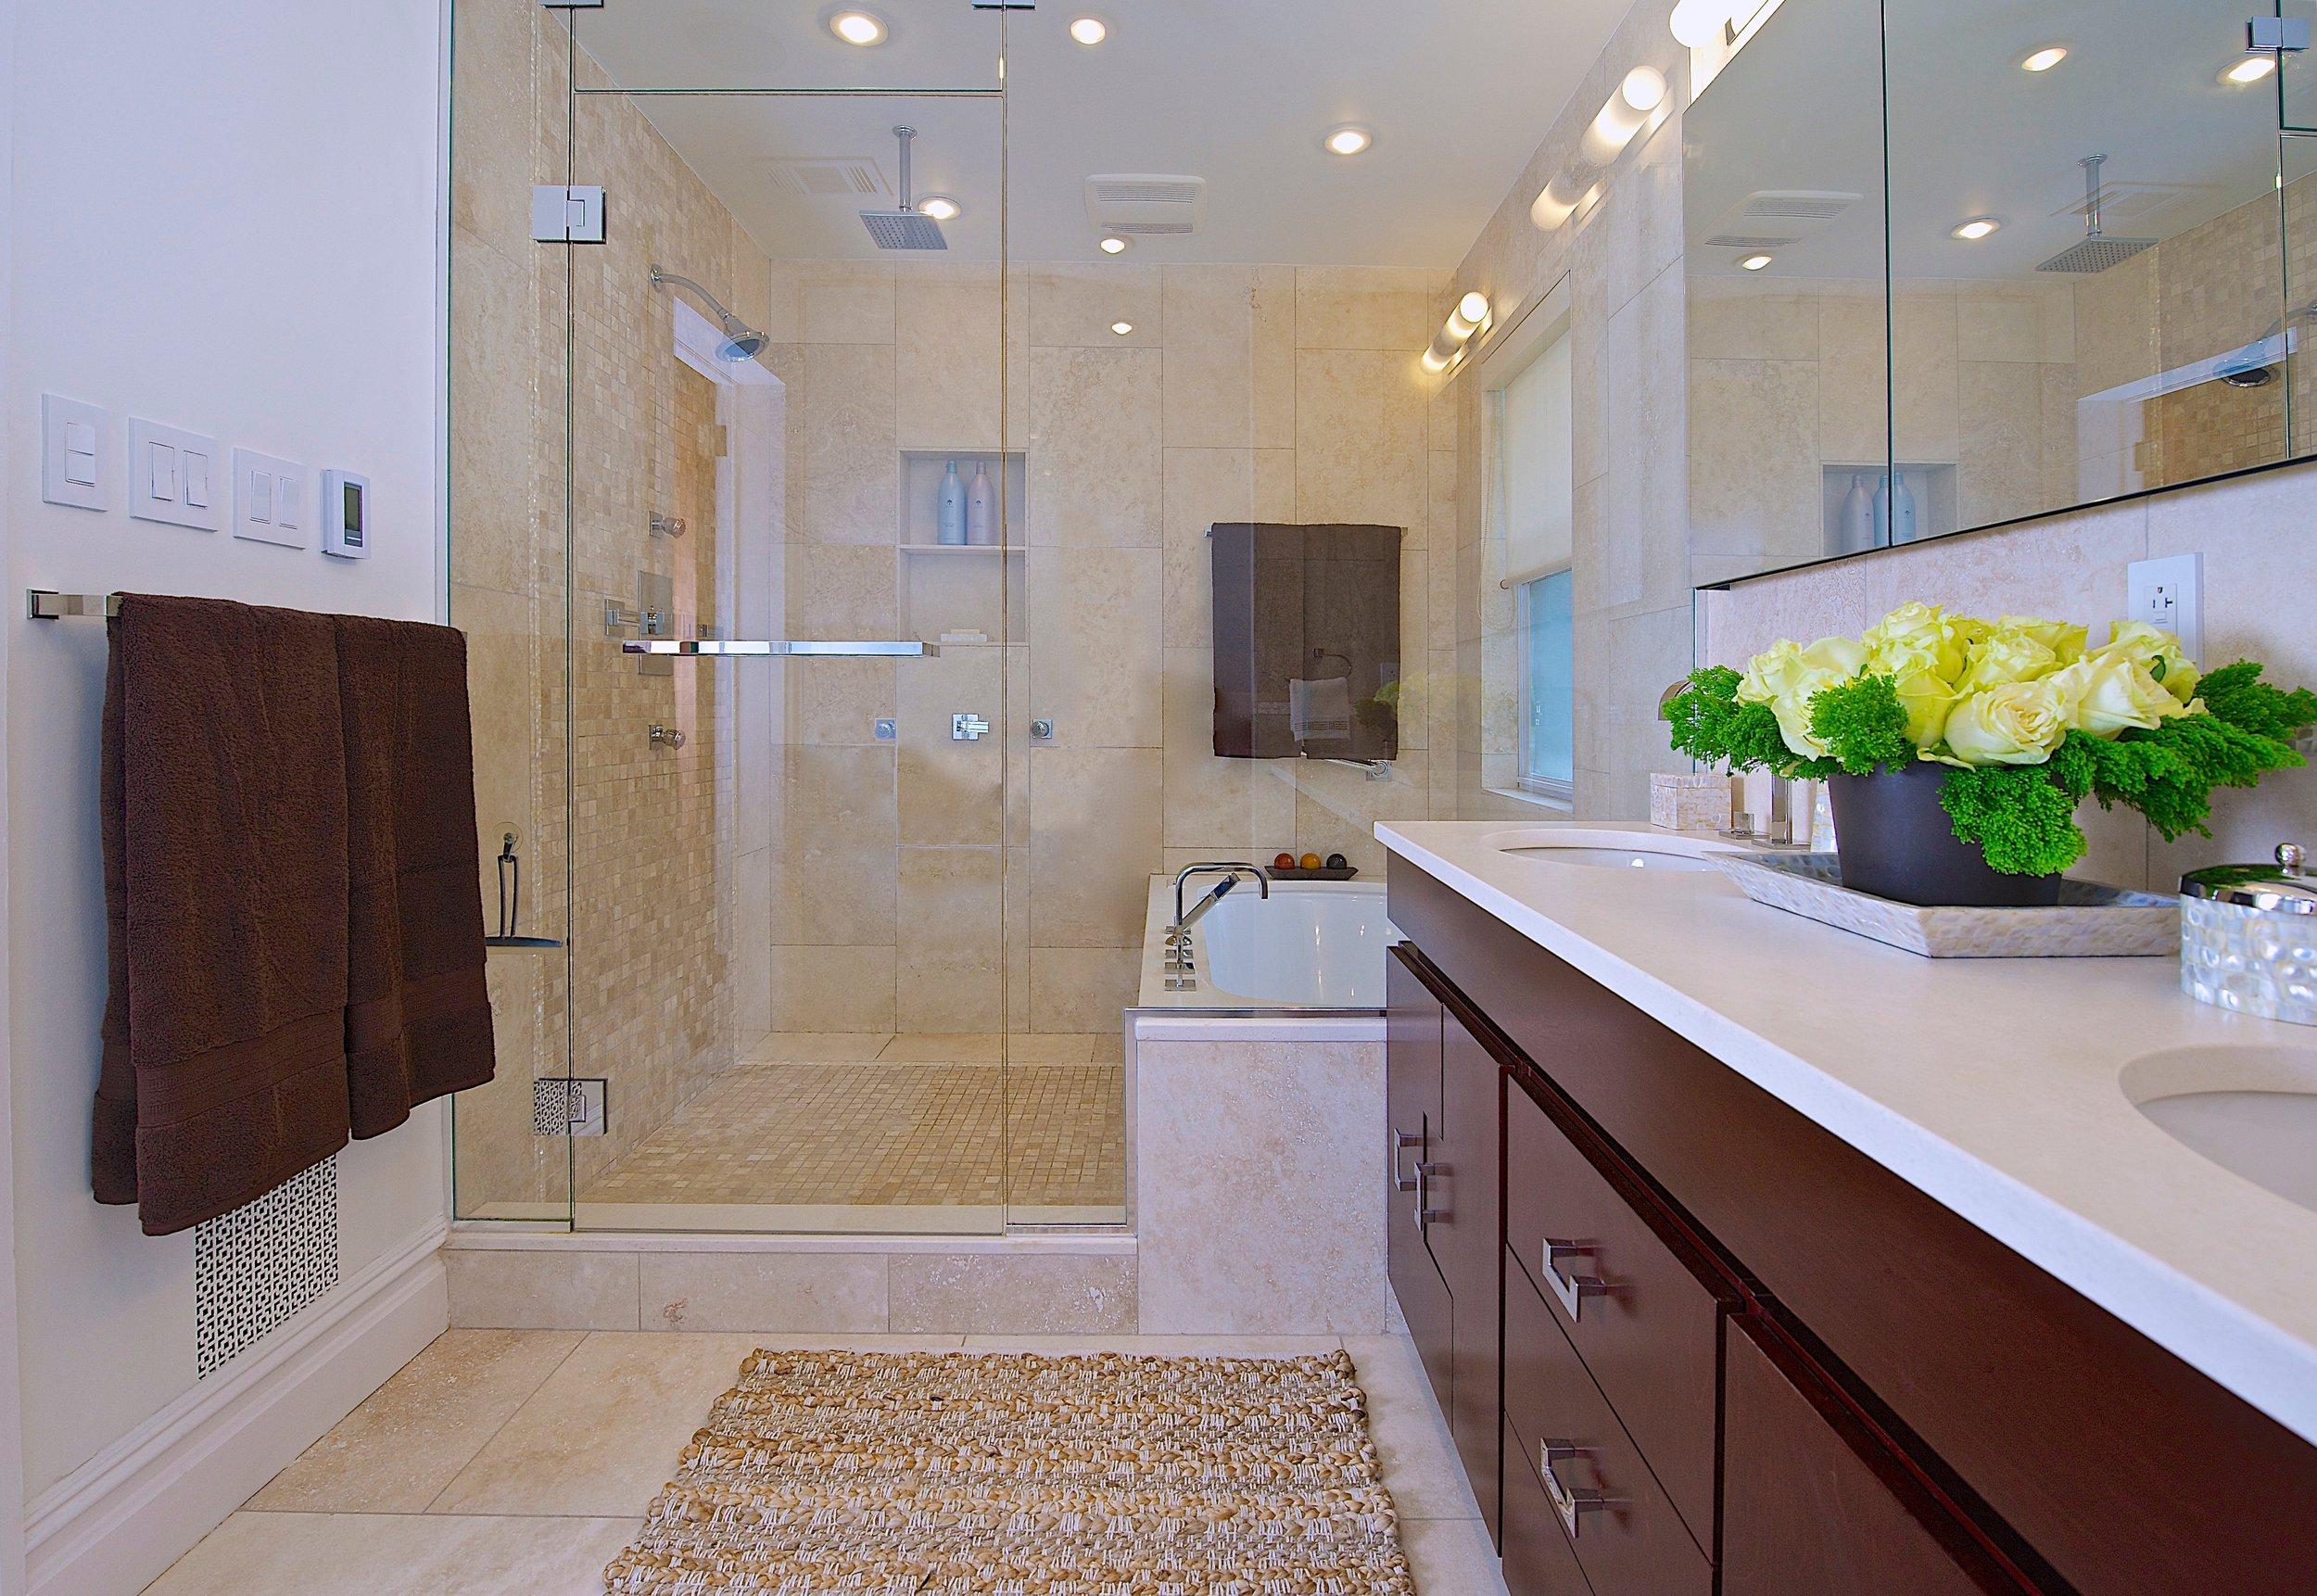 Keita Turner Bathroom______06086277-10FB-43D5-9D3F-9C63562A1471.JPG